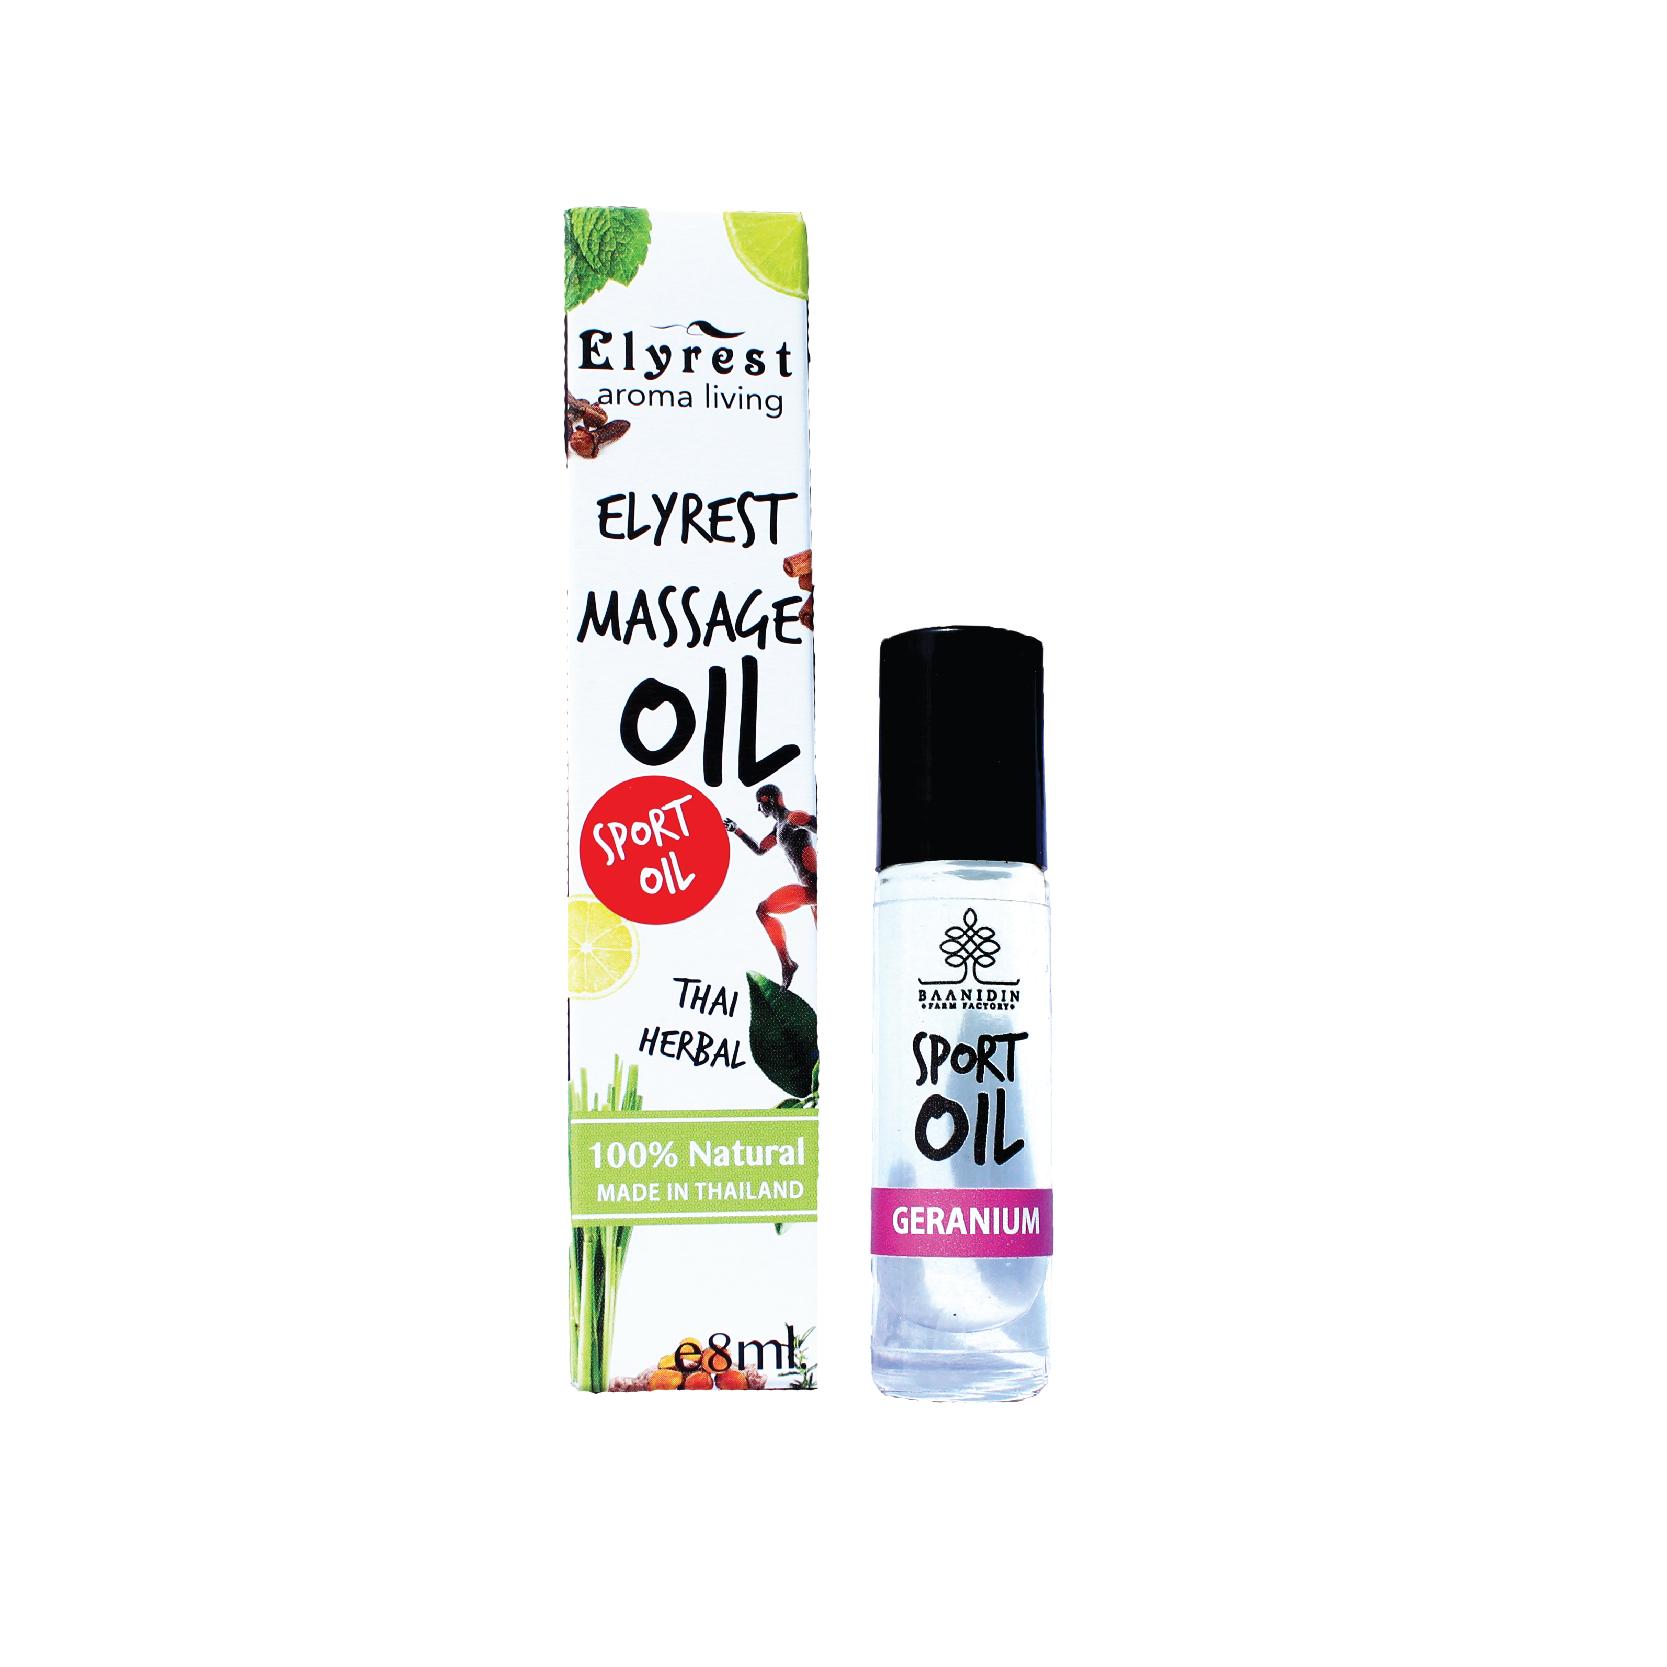 Elyrest by baanidin Herbal oil Geranium